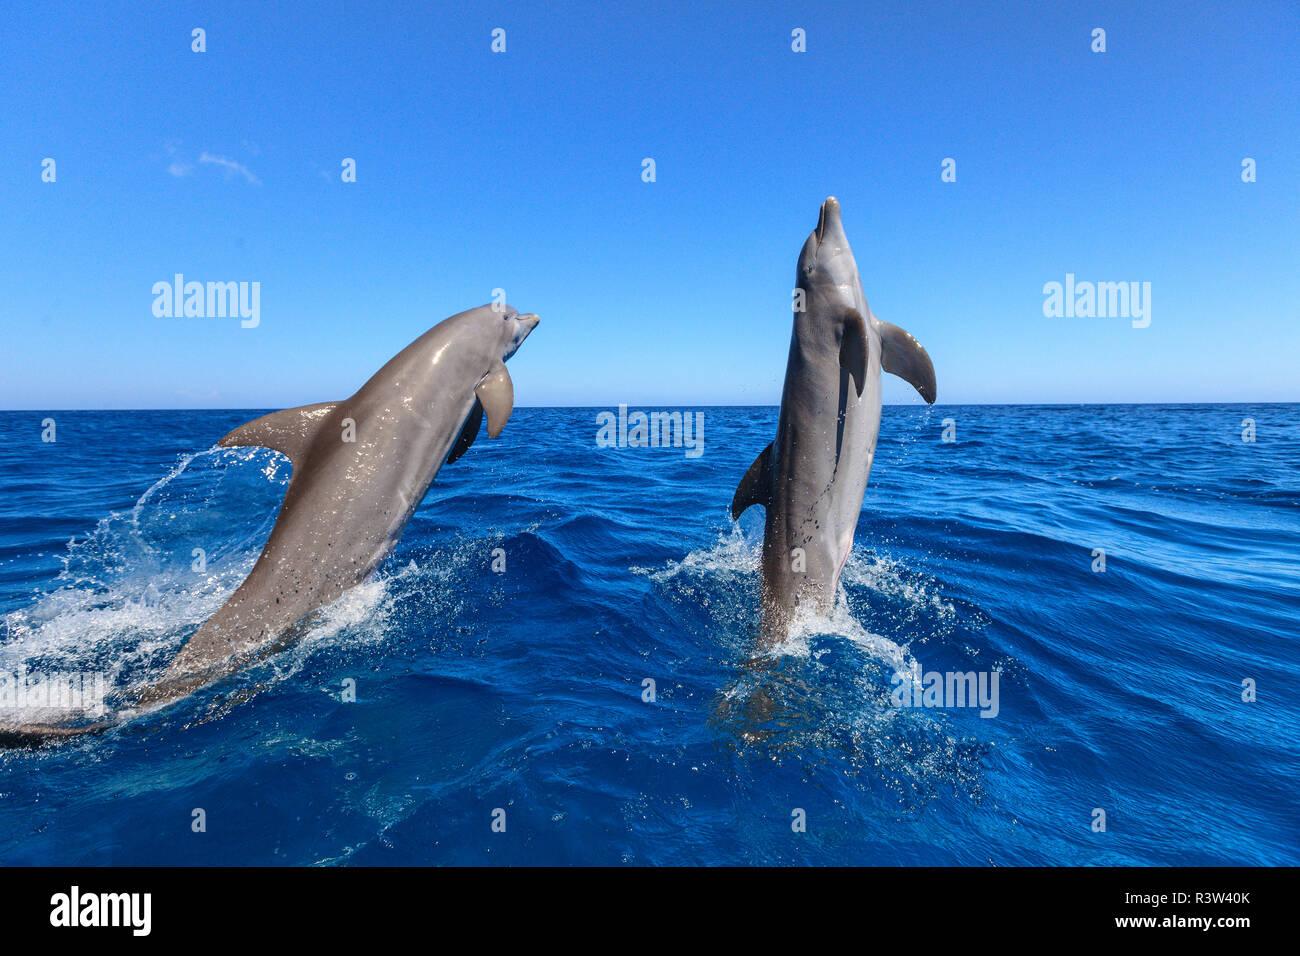 Bottlenose Dolphins (Tursiops truncatus) Caribbean Sea, Roatan, Bay Islands, Honduras Stock Photo